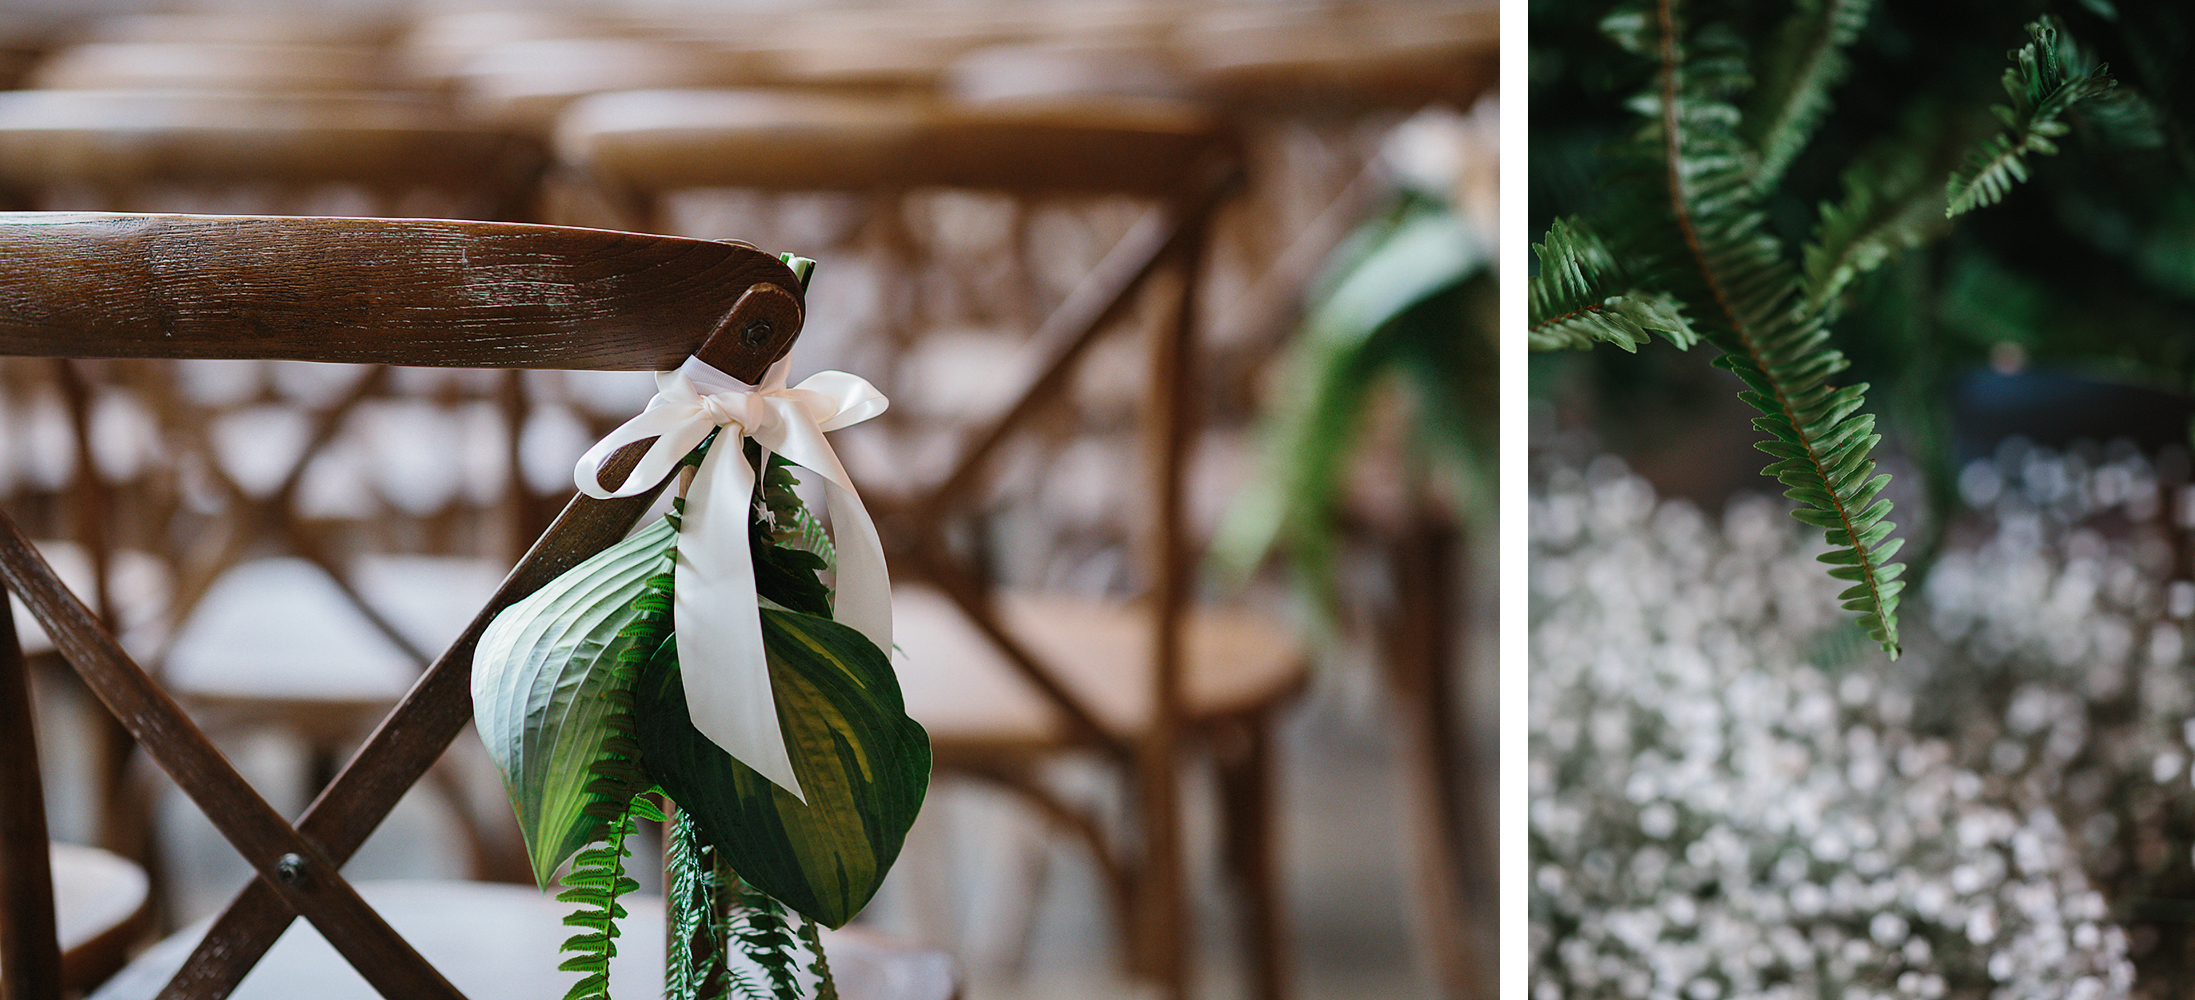 do1-wntown-toronto-wedding-photographer-ryanne-hollies-photography-airship37-distillery-district-wedding-day-modern-minimalist-venues-in-toronto-ceremony-space-diy-decor-greenery-vibes-inspiration.jpg